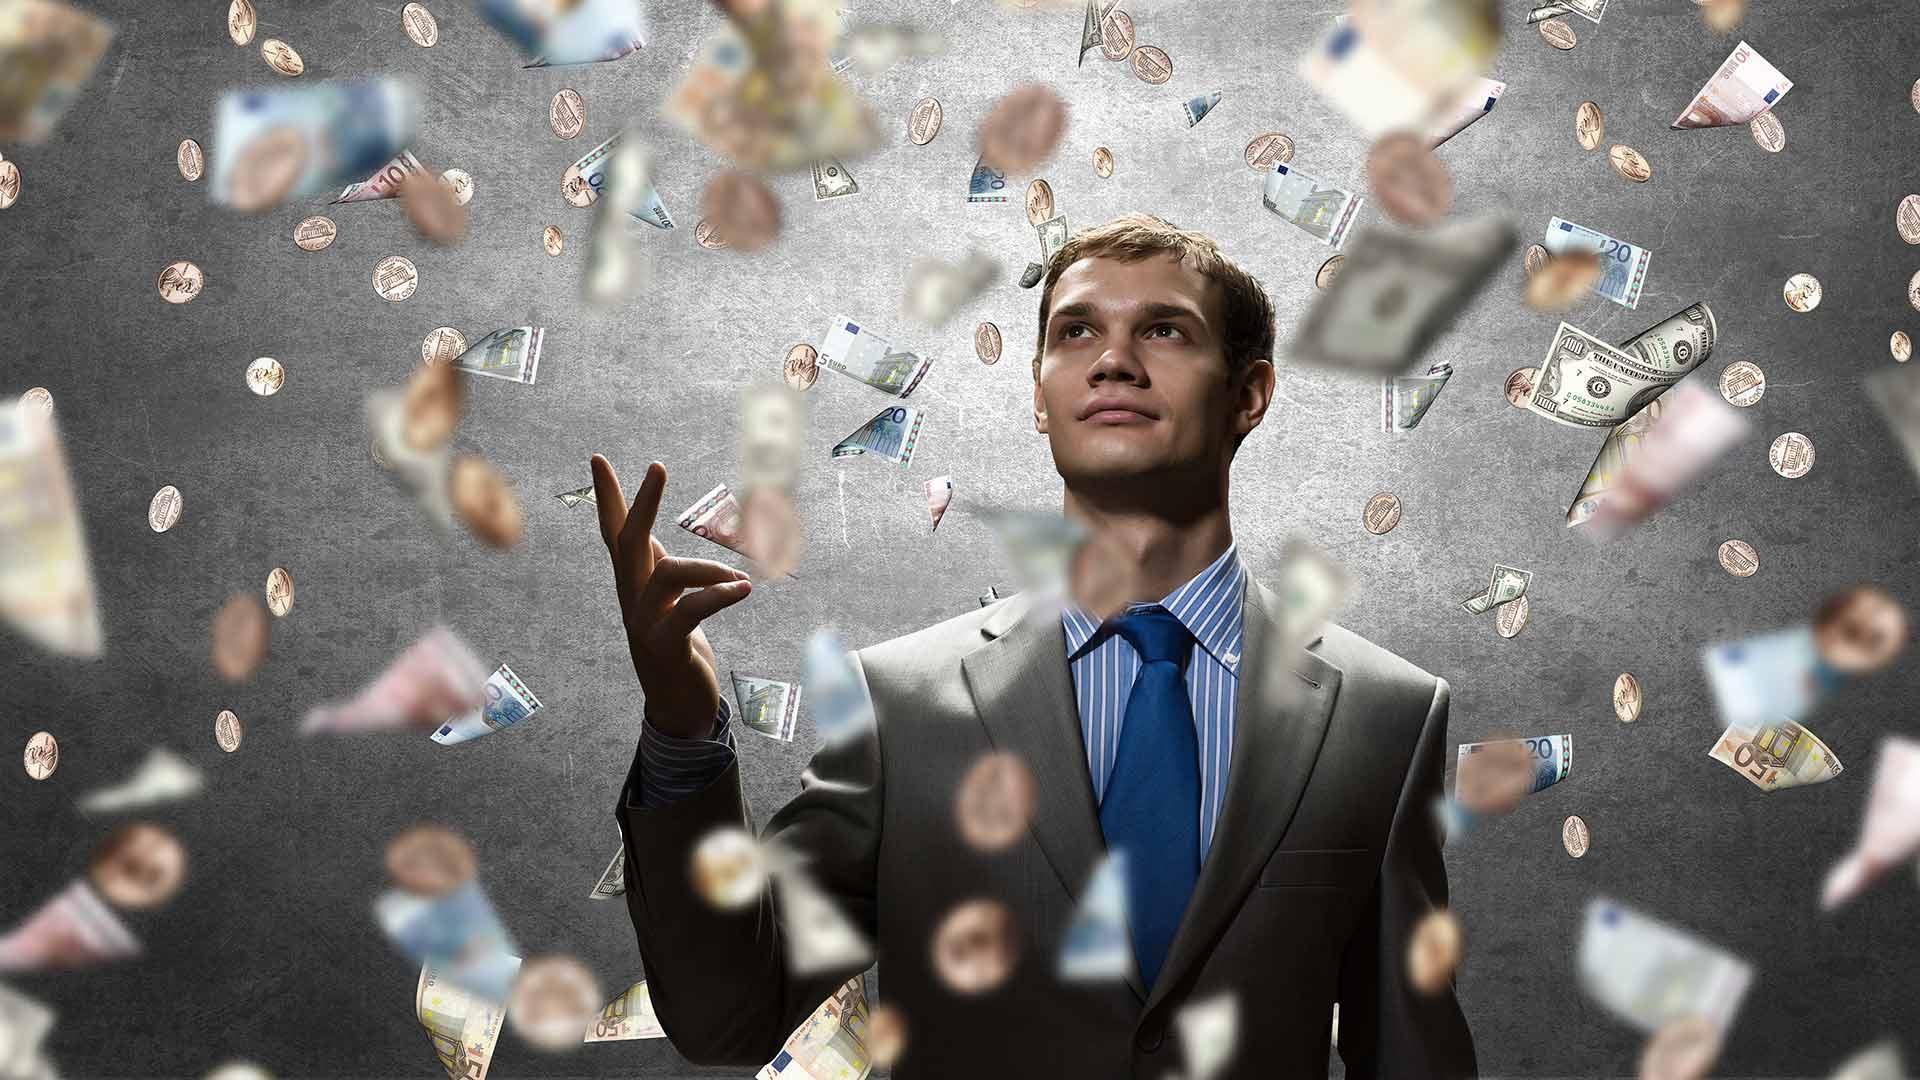 The rich person